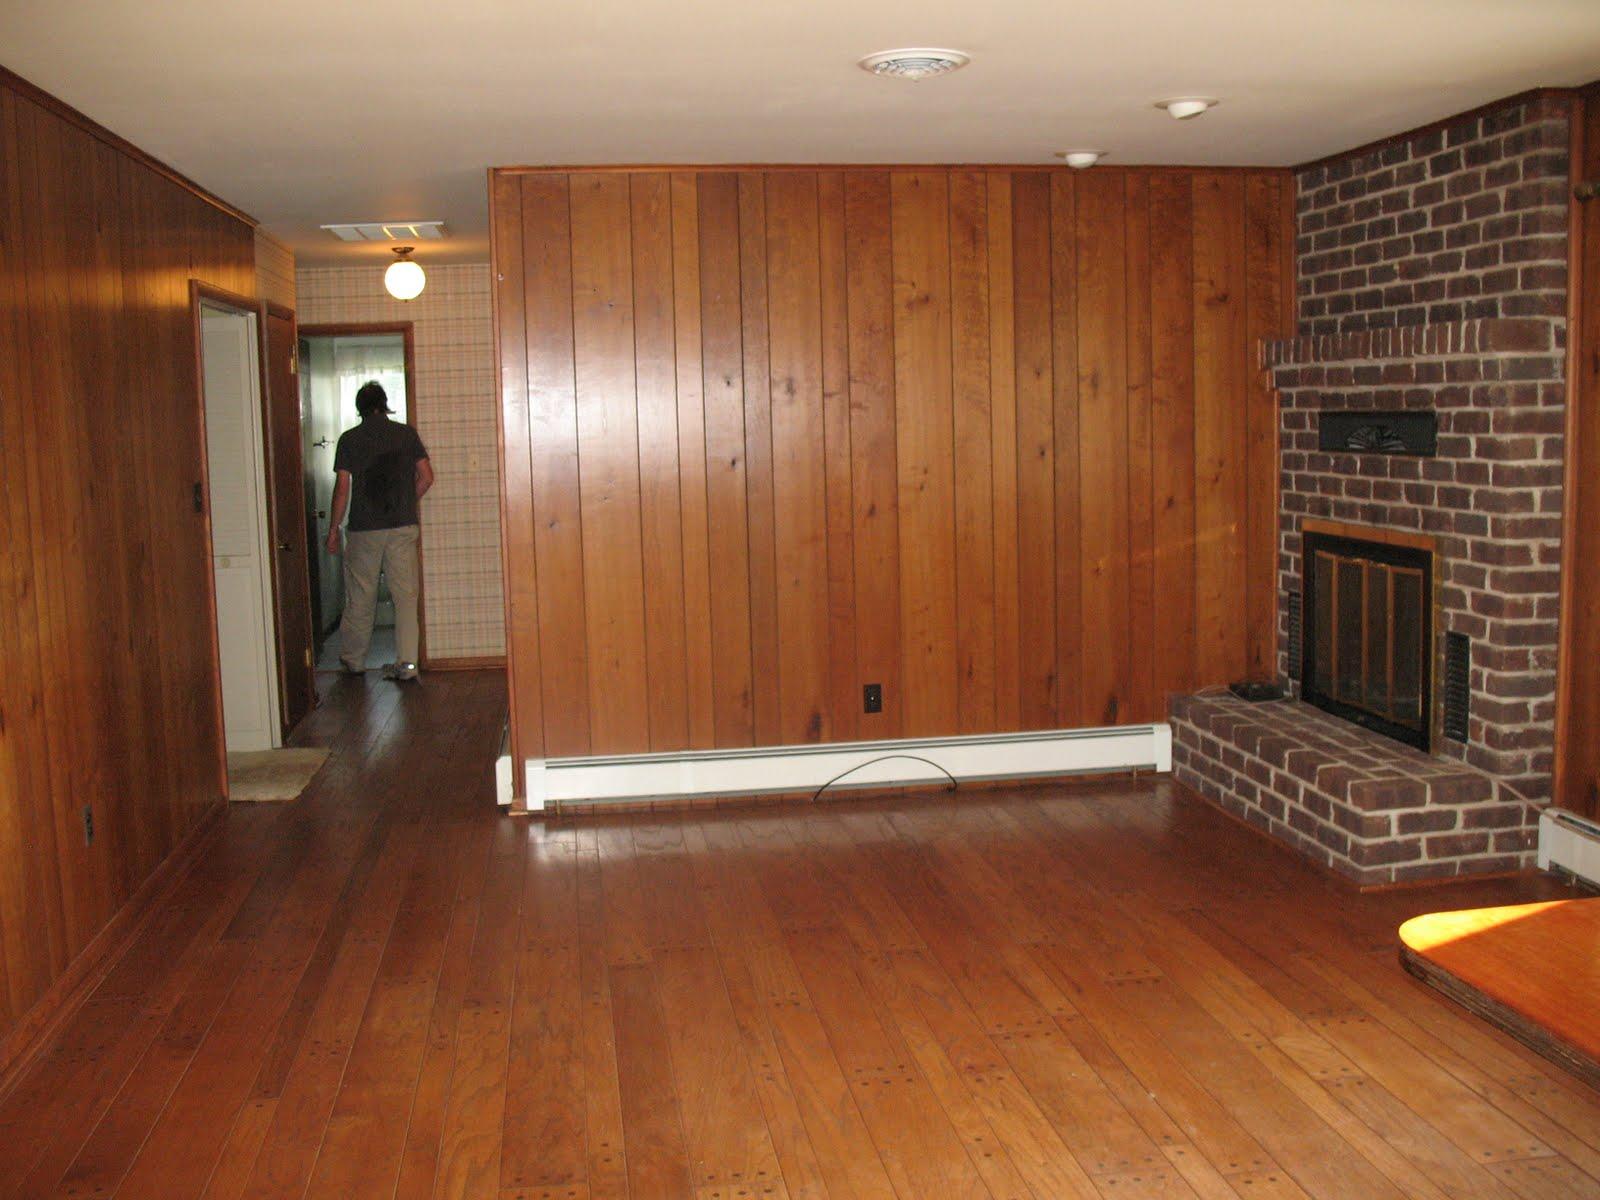 Lara and Bill: Painting wood paneling